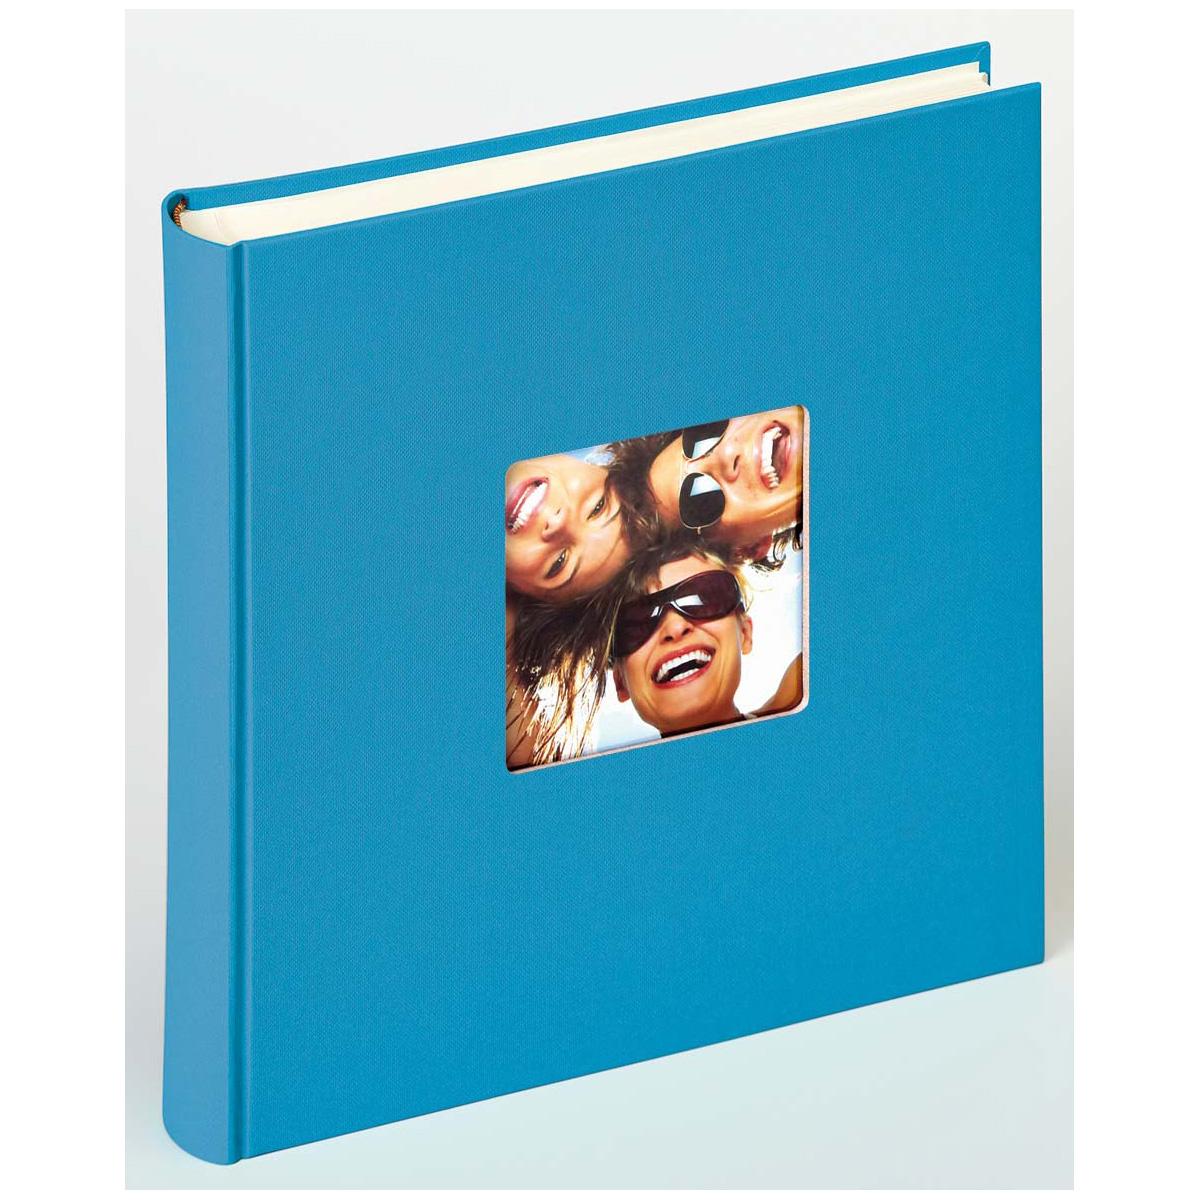 Buchalbum Fun mit 100 Seiten, 30x30 cm oceanblau